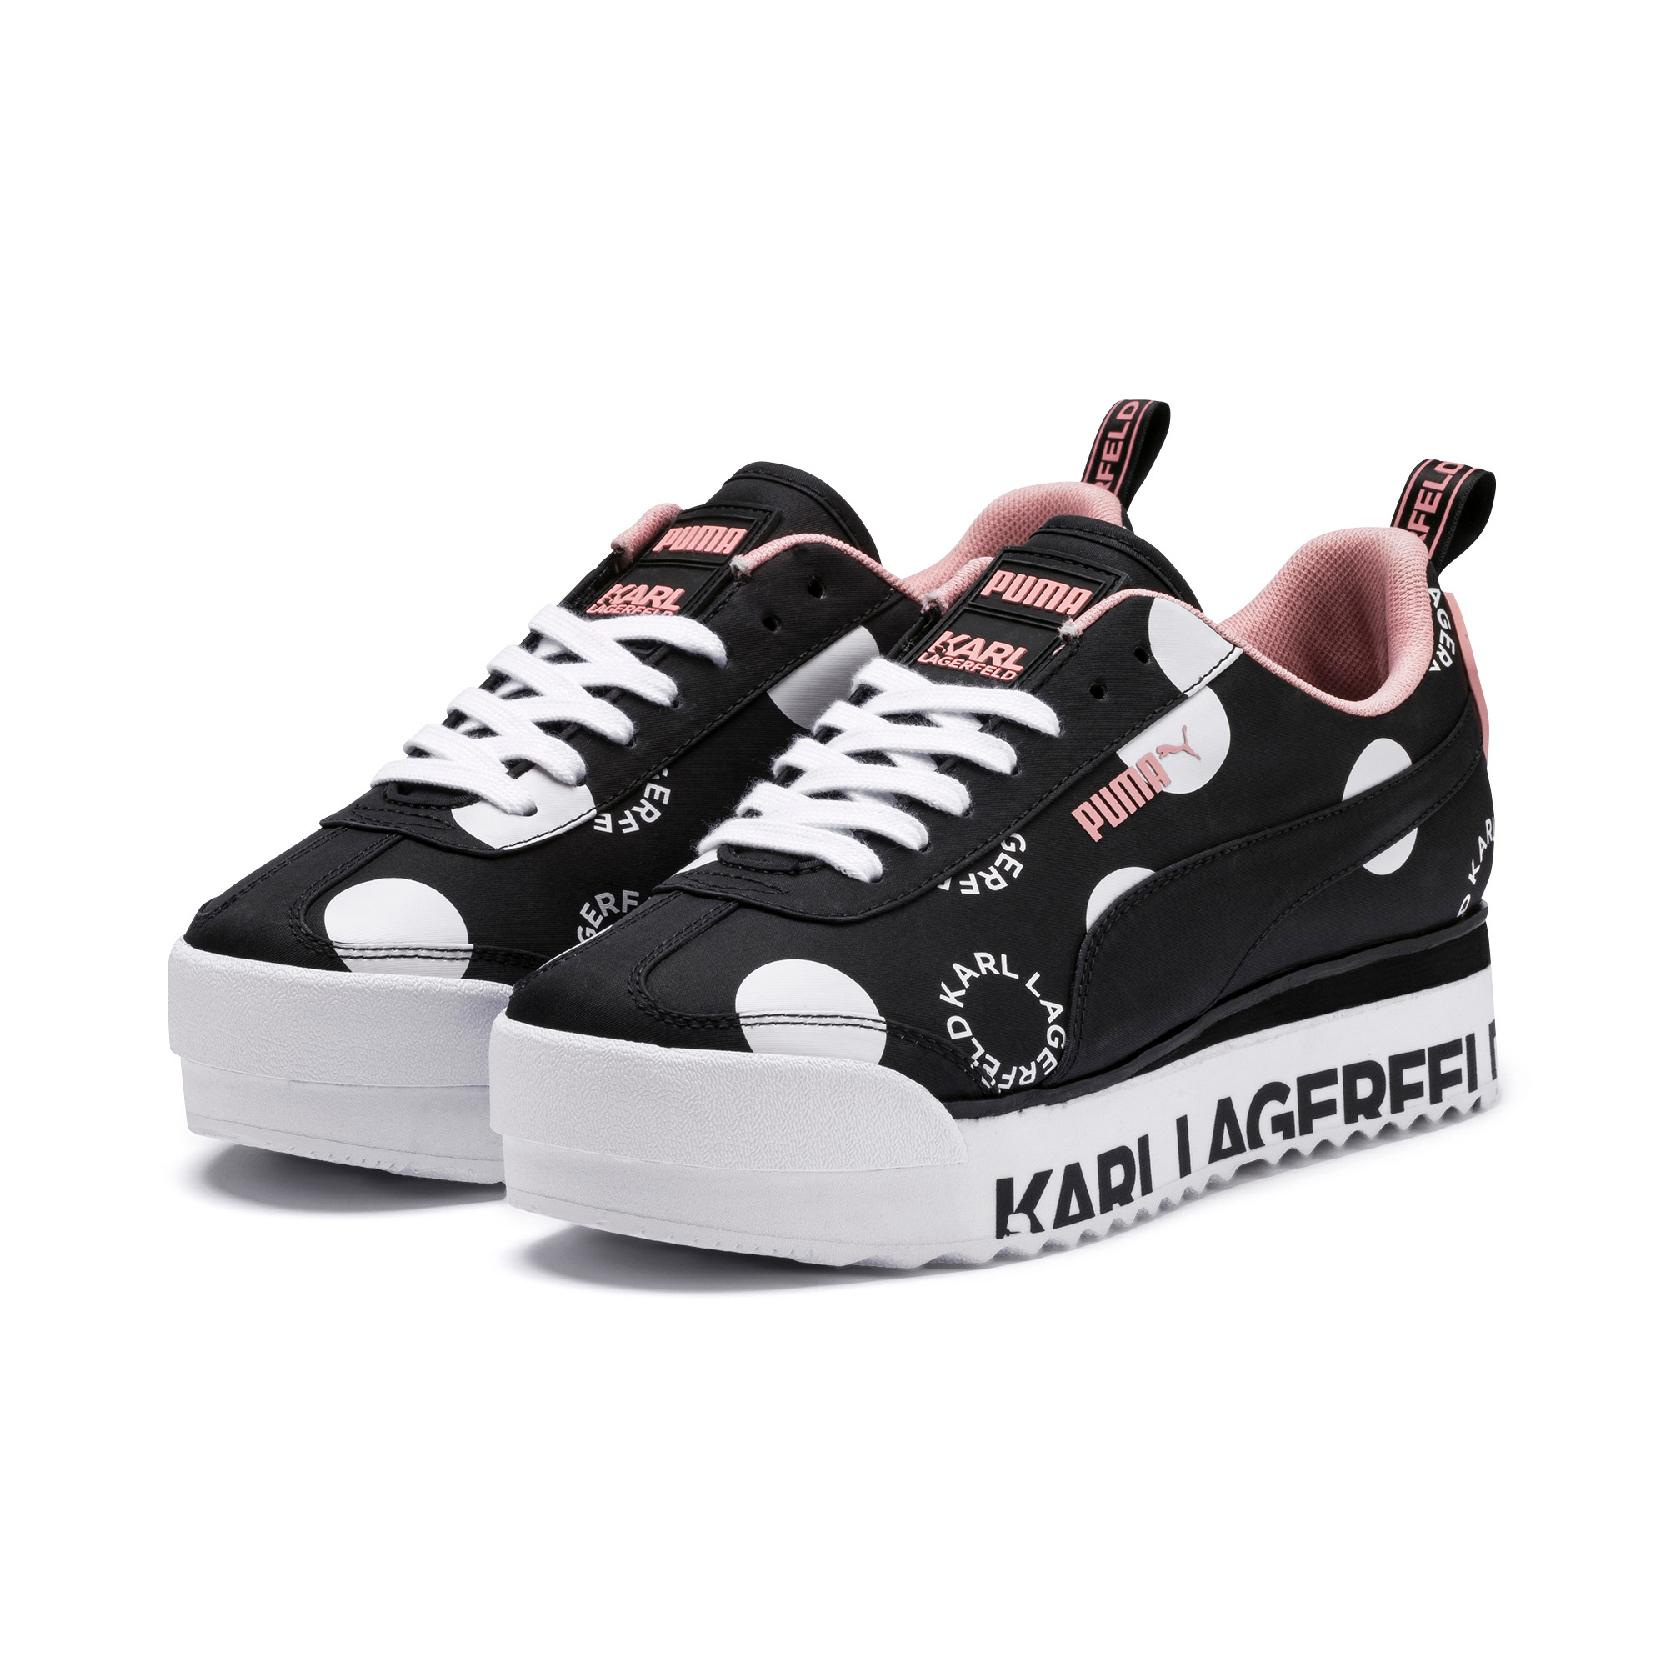 We Need This Chic Puma x Karl Lagerfeld